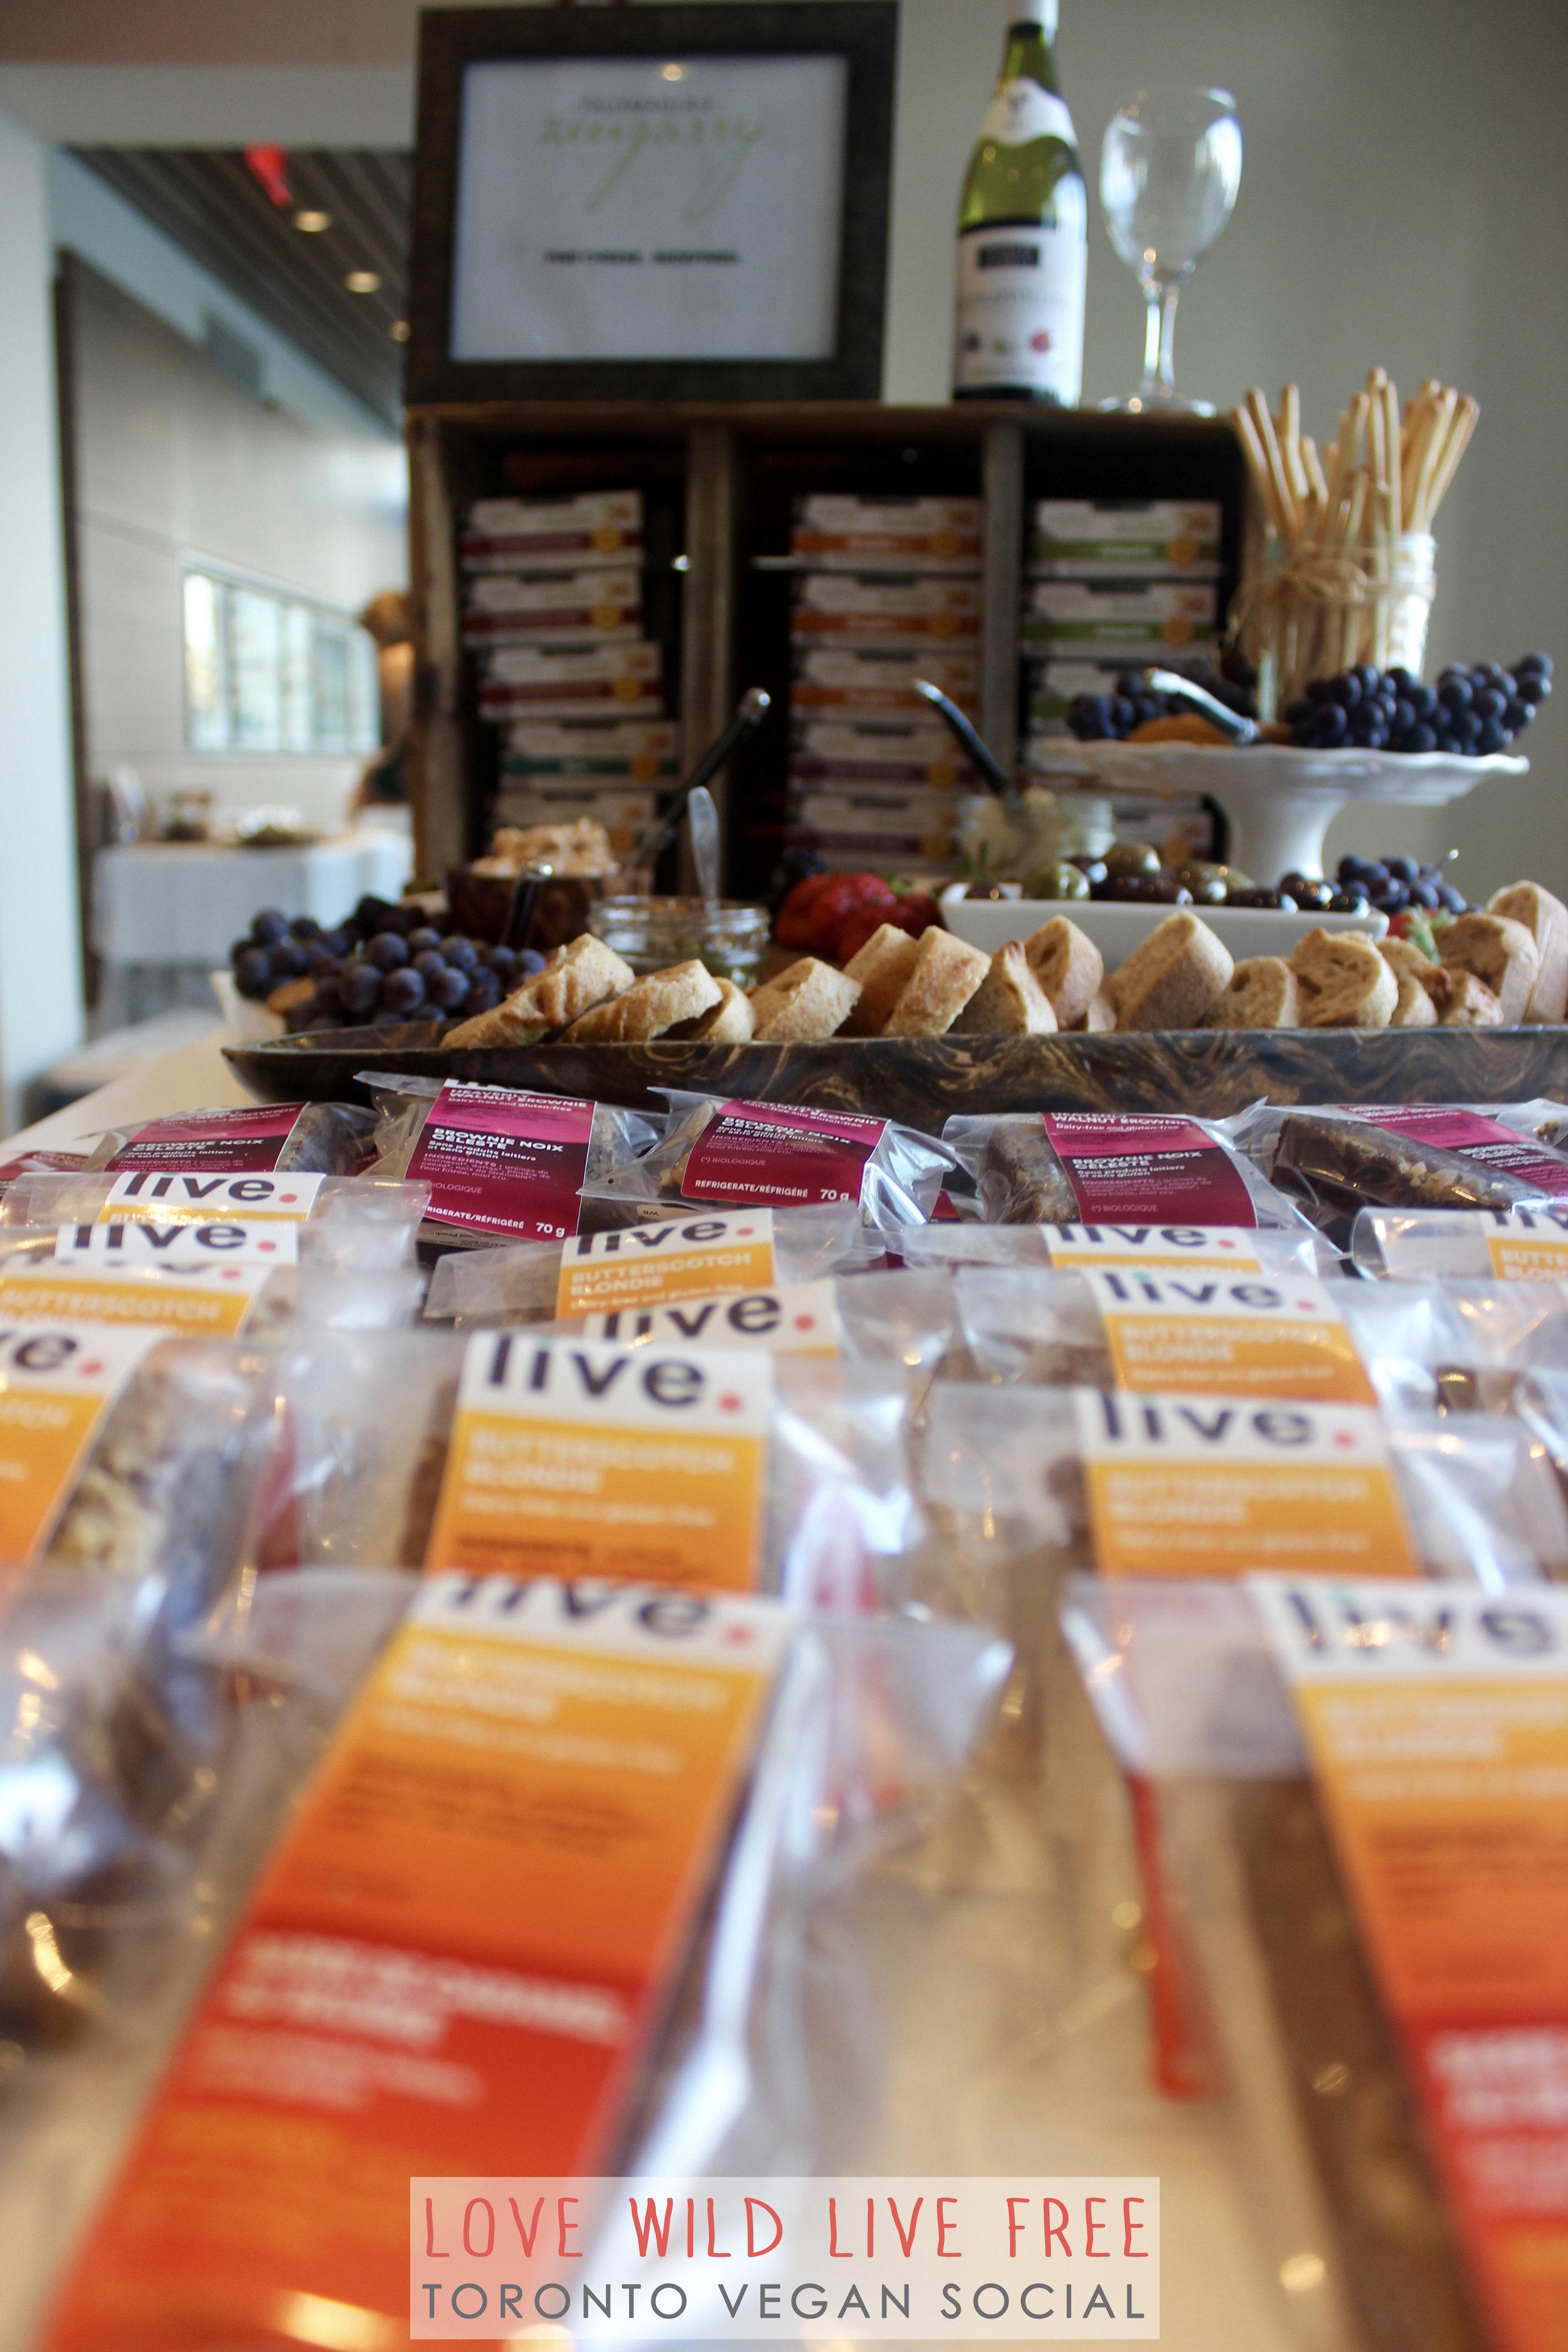 Live Organics Brownies